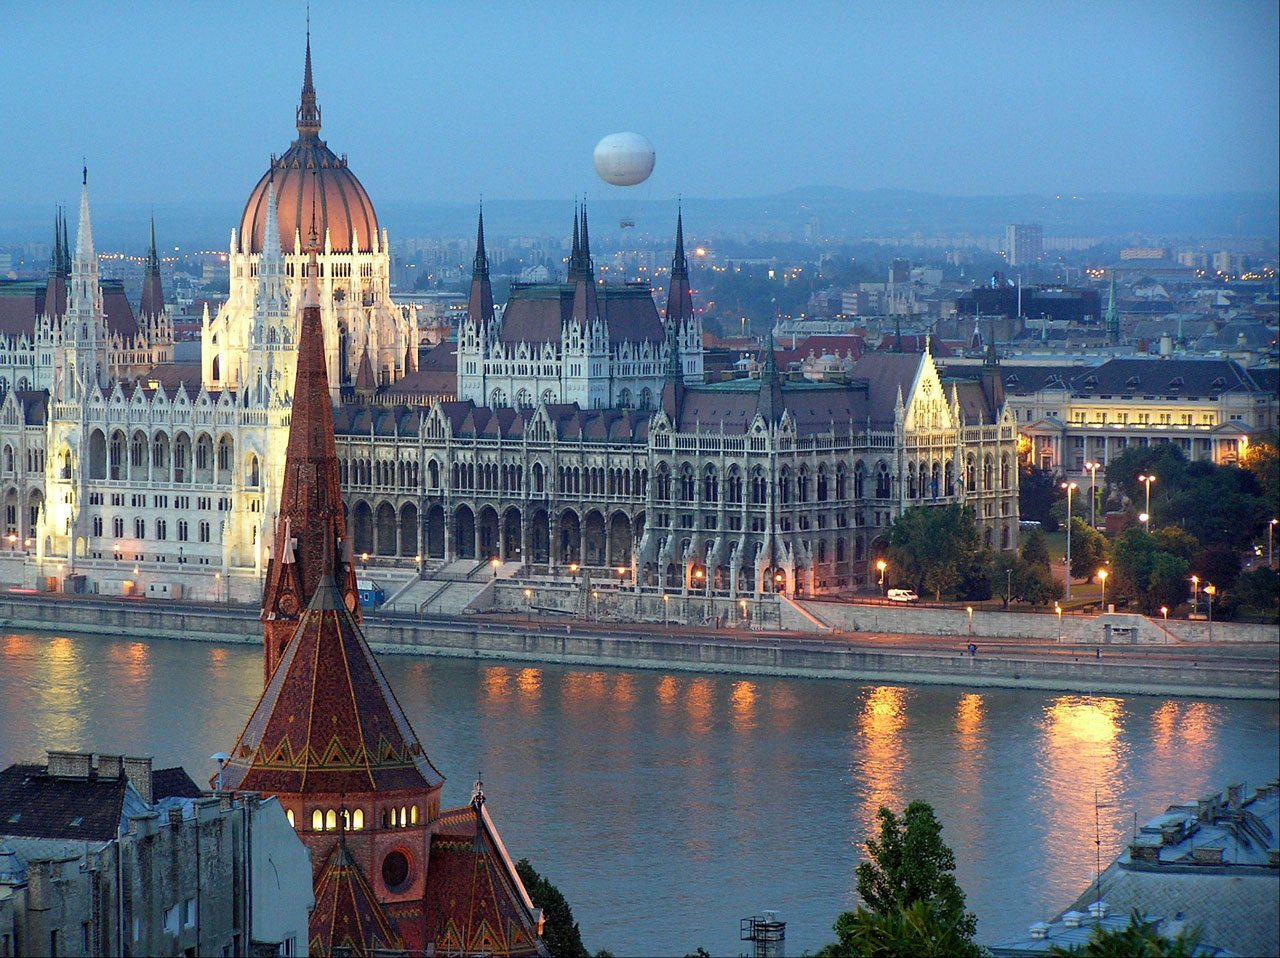 Viyana Yolculuk Terapisi